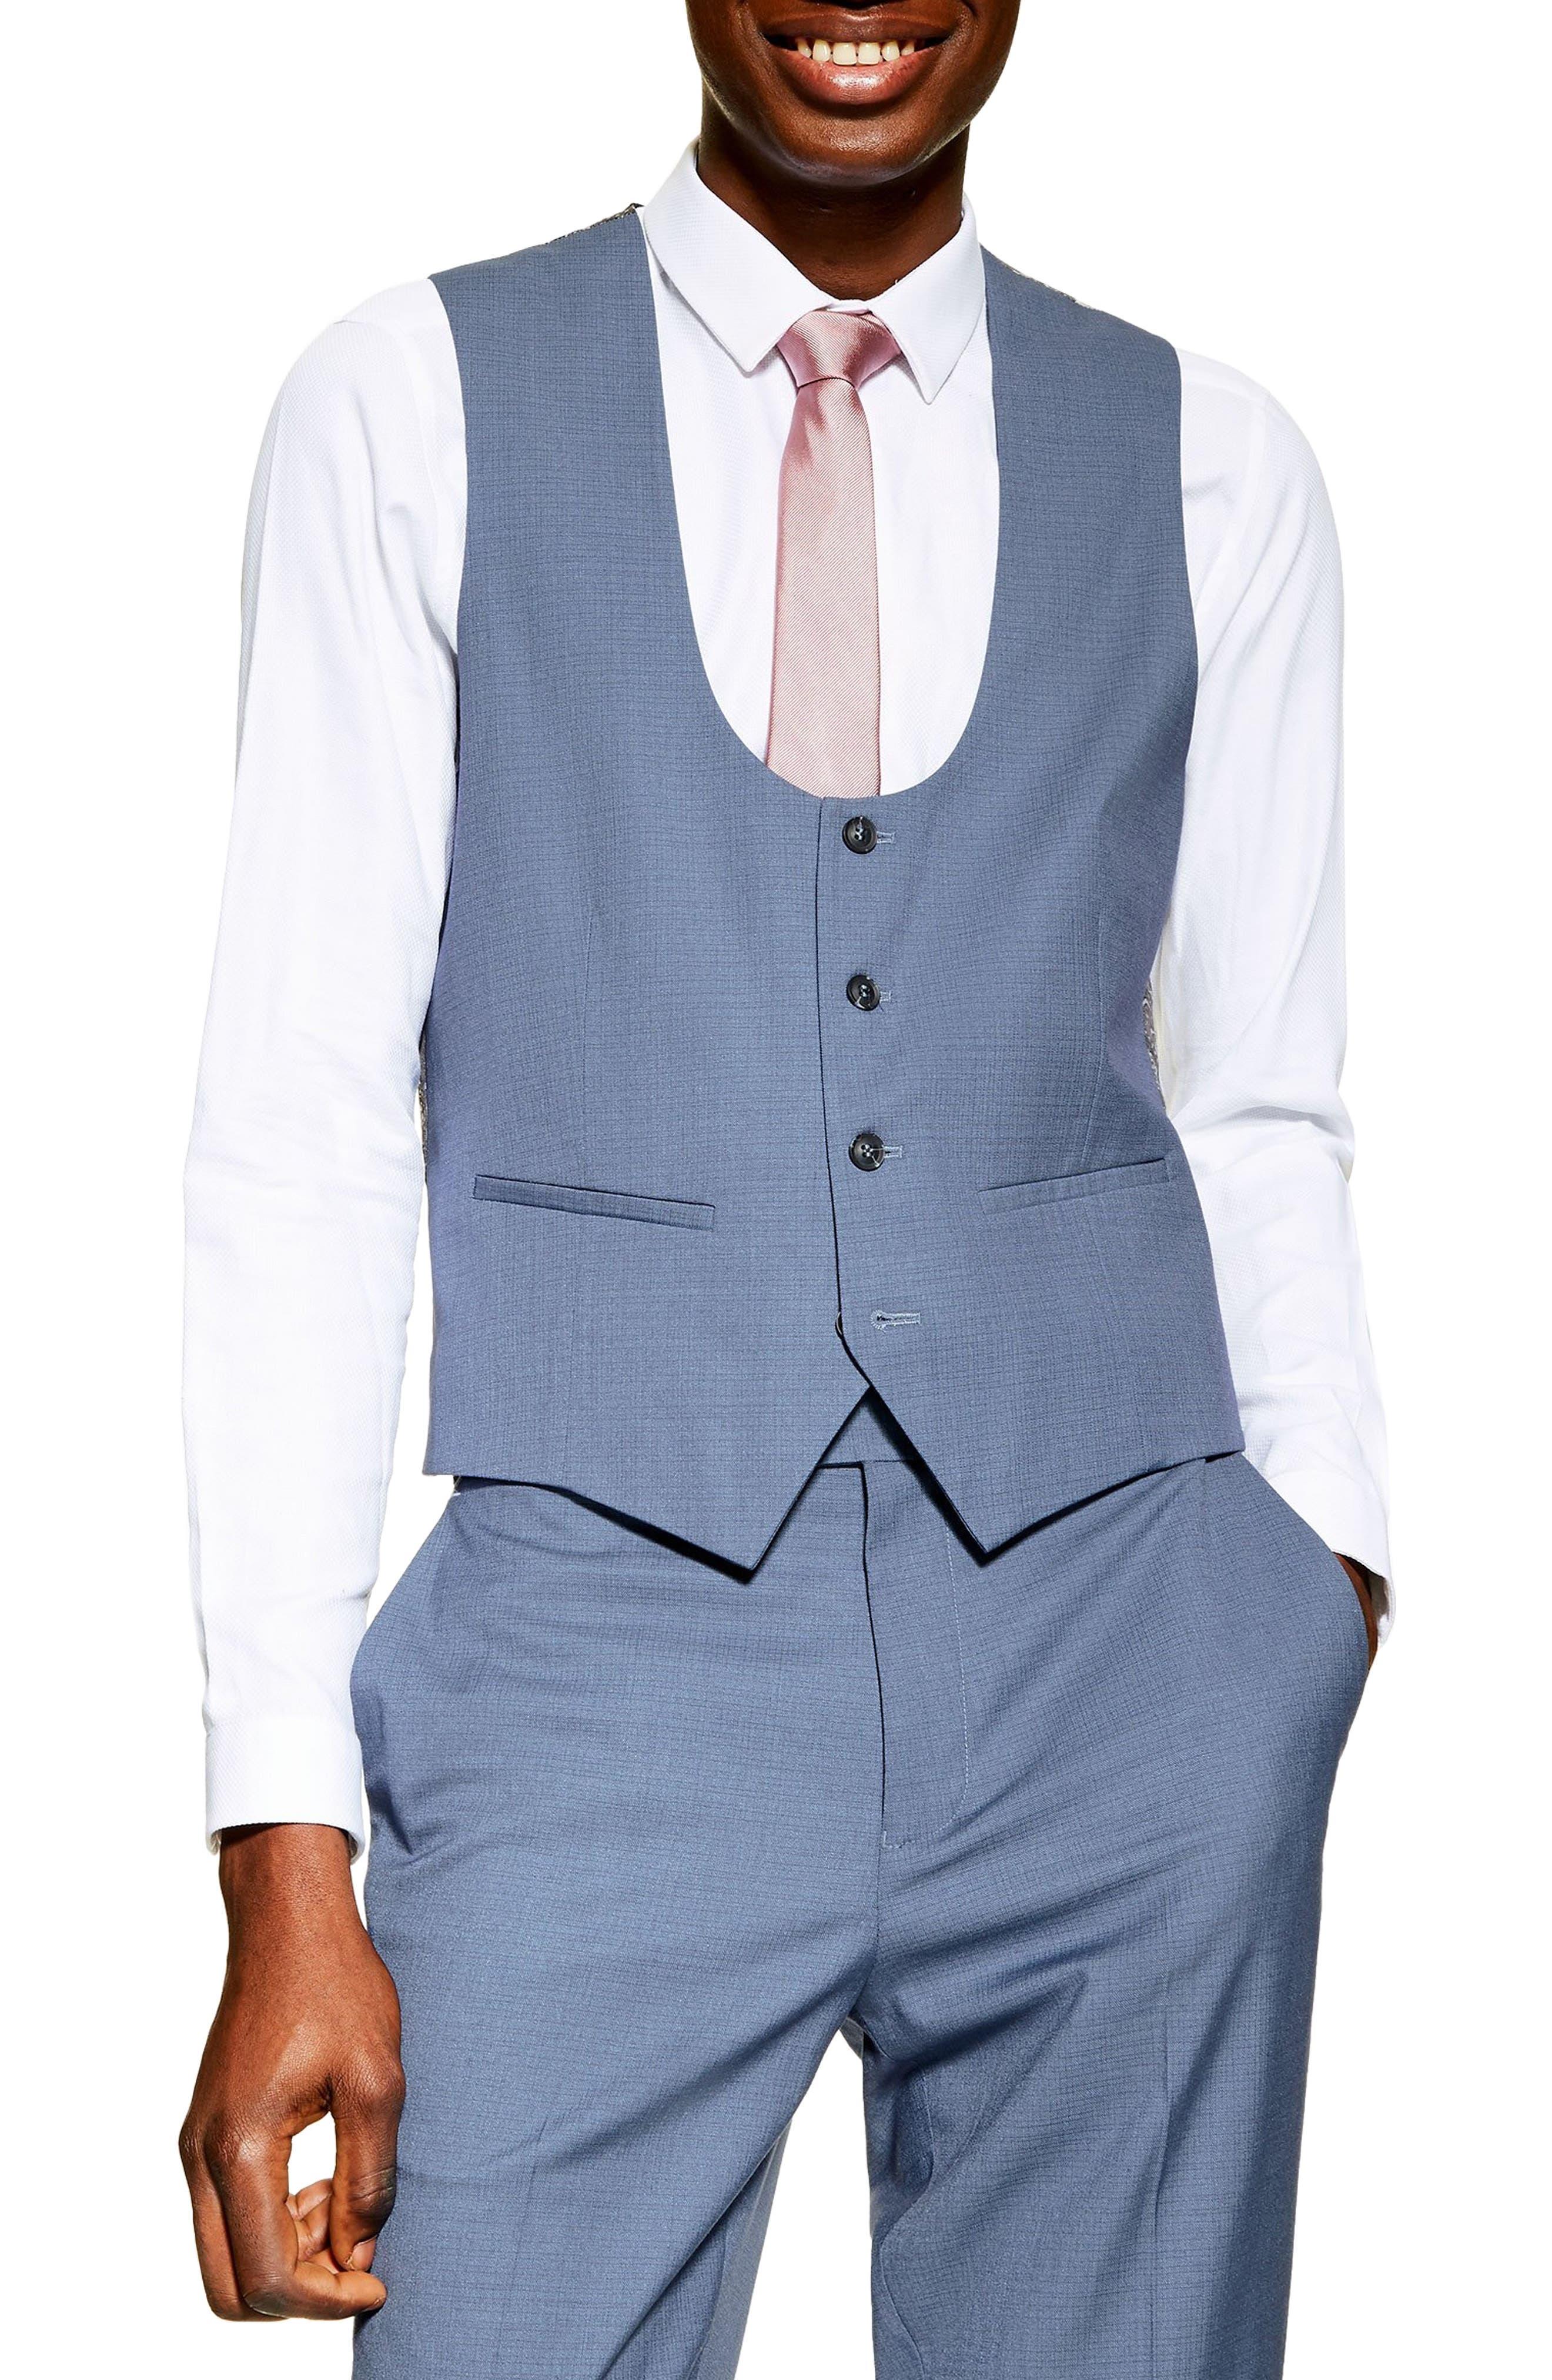 1920s Style Mens Vests Mens Topman Slim Fit Suit Vest Size 48 - Blue $47.98 AT vintagedancer.com